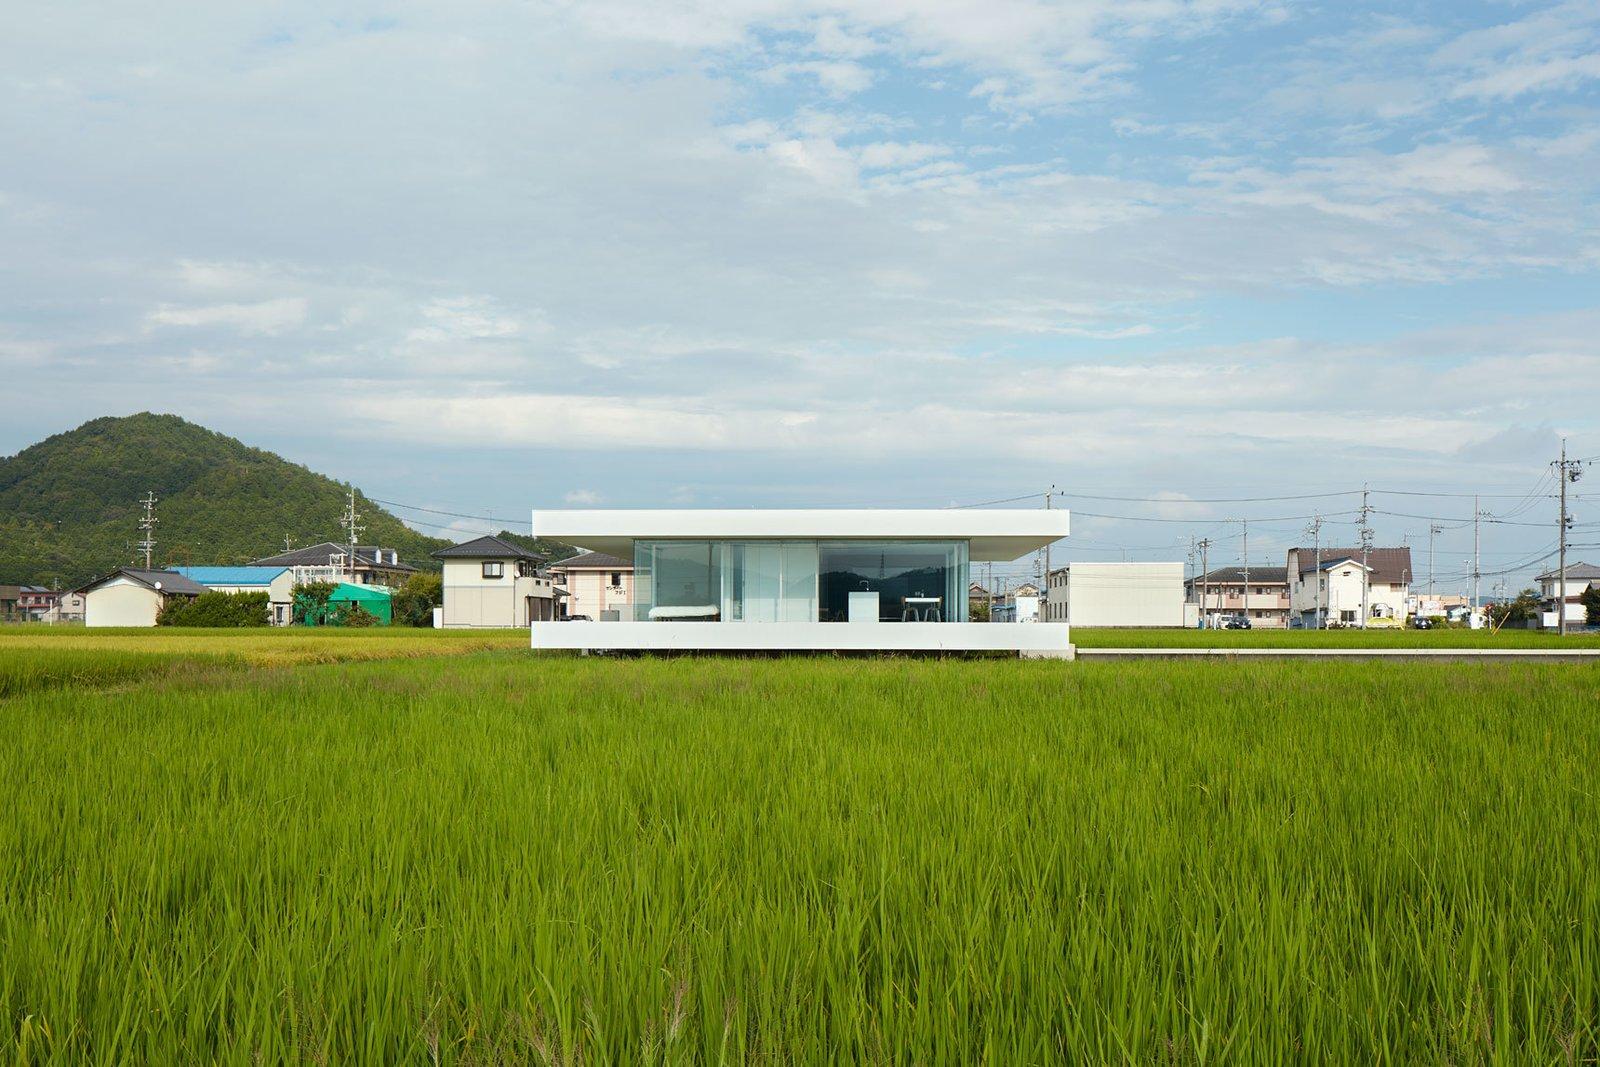 Photo 8 of 12 in F Residence by Shinichi Ogawa & Associates